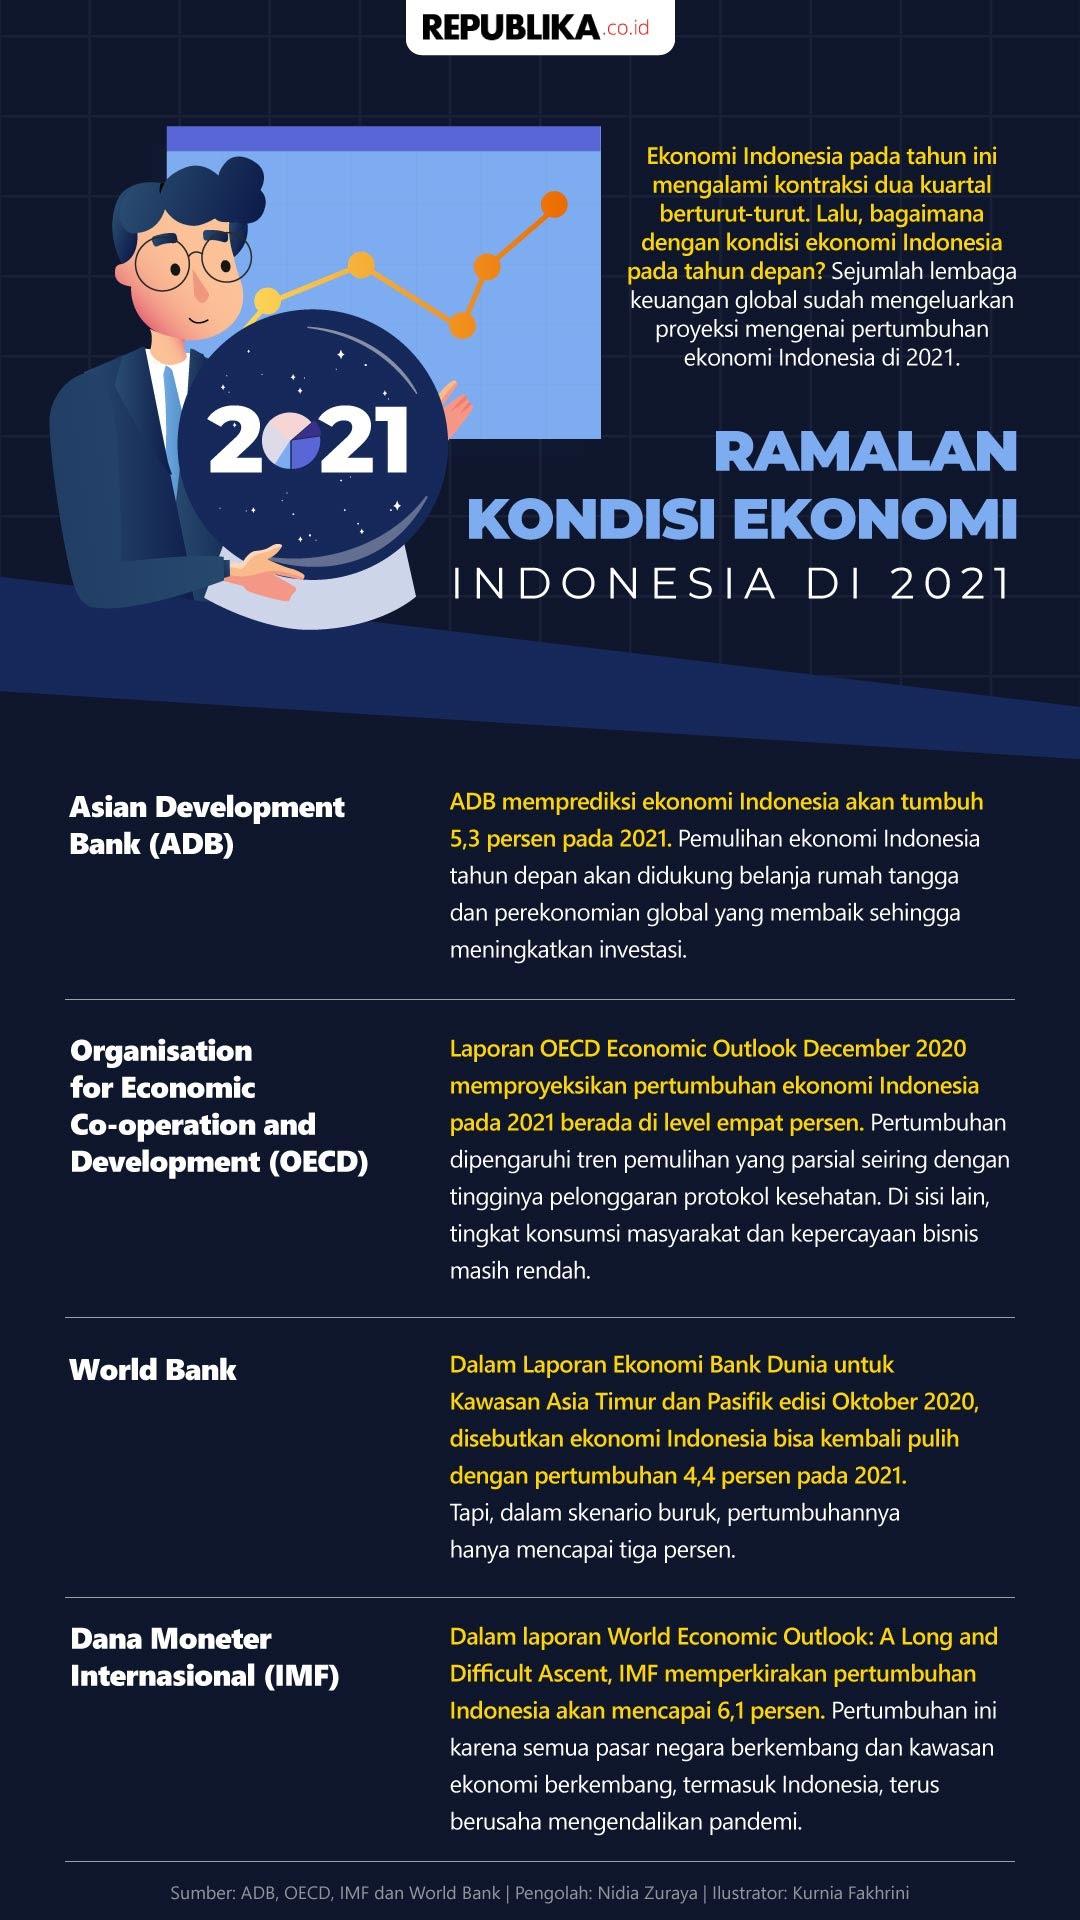 Infografis Ramalan Kondisi Ekonomi Indonesia di 2021 ...